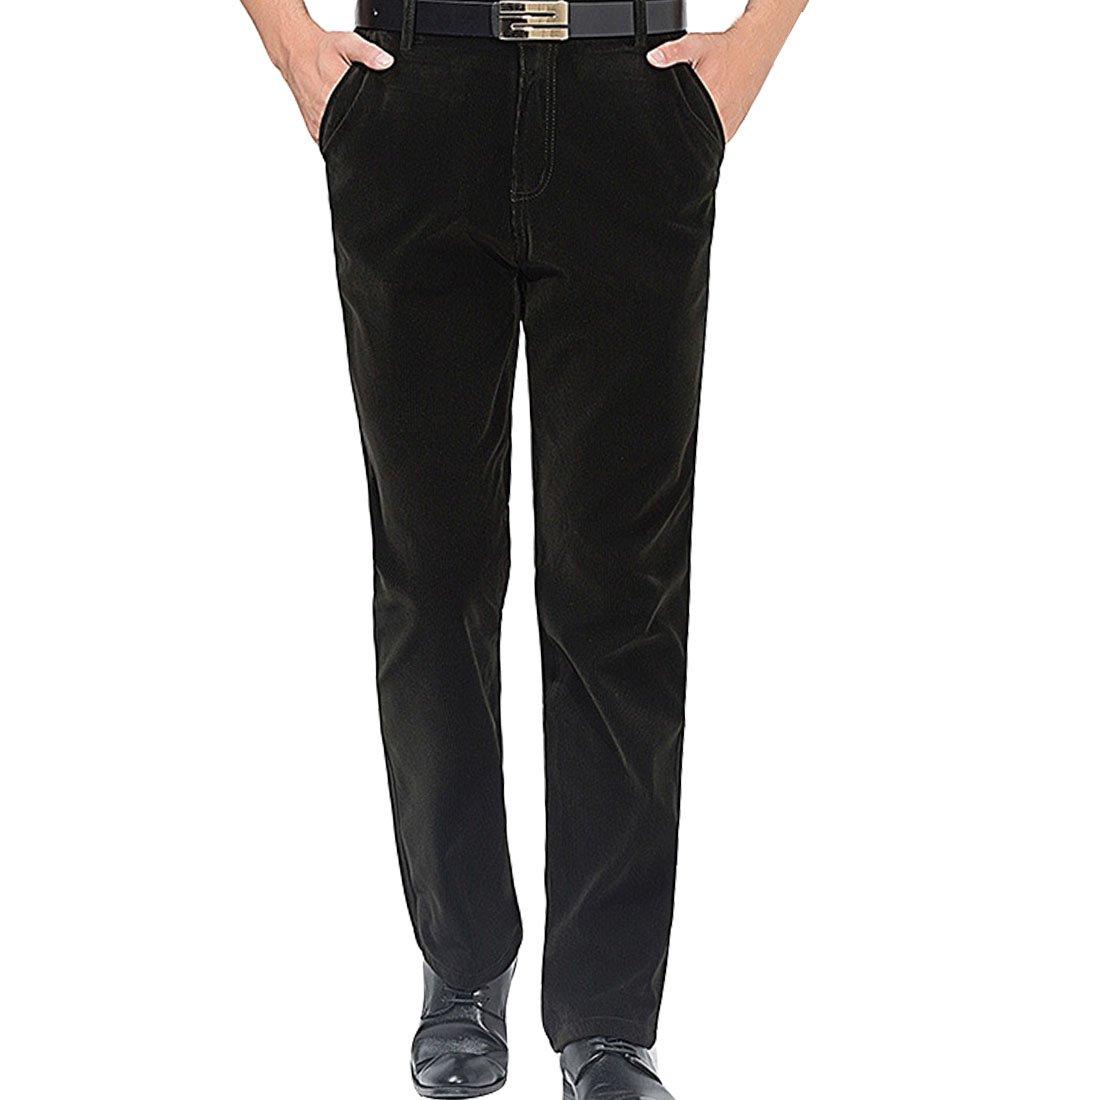 Hzcx Fashion Men's Corduroy Casual High Waist Relax Fit Classic Long Pants